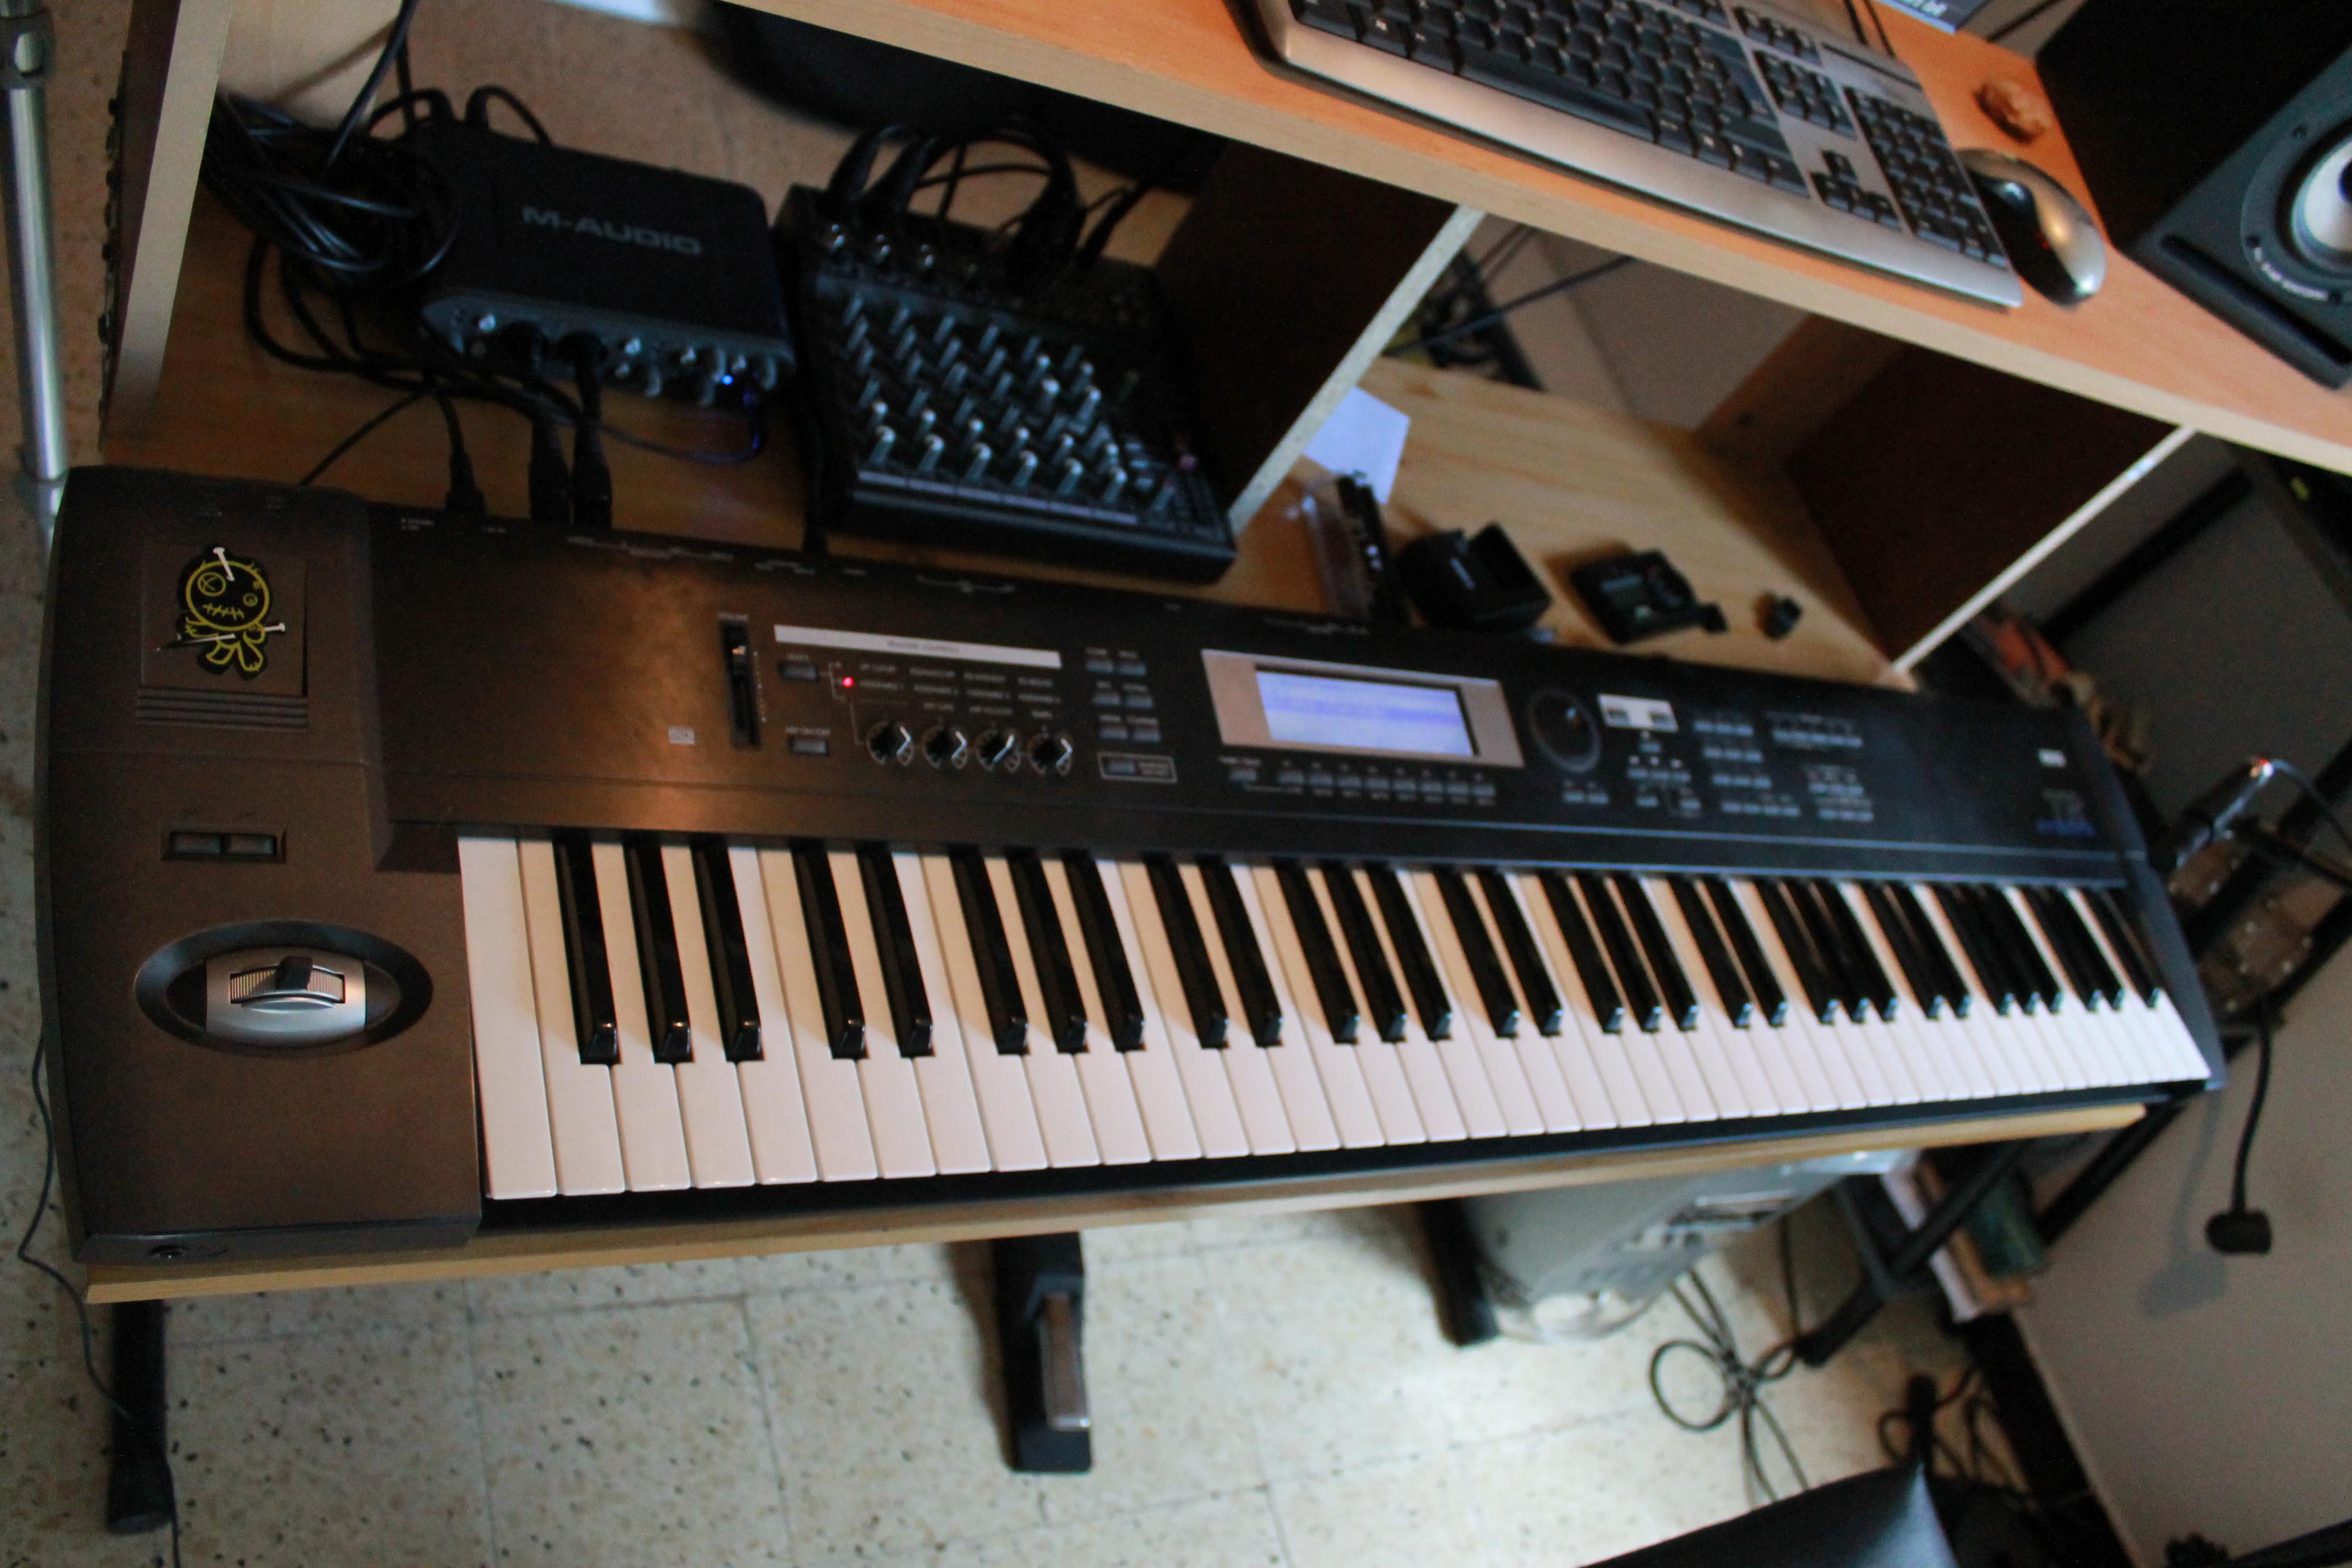 korg triton le 76 image 459739 audiofanzine rh en audiofanzine com Korg Triton Extreme 76 Korg Triton Extreme 76